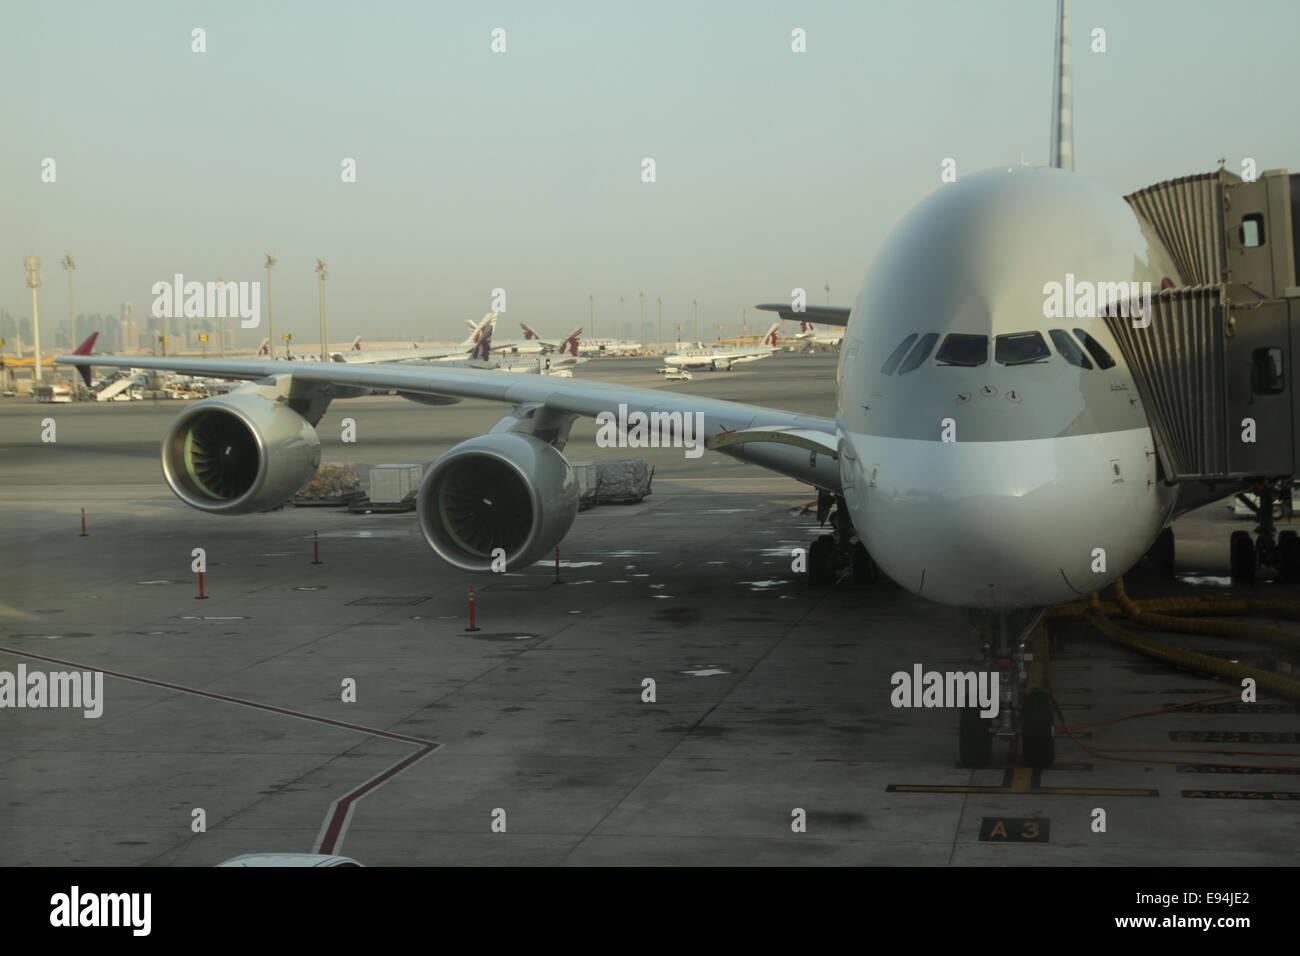 Doha, Qatar - 19 October 2014. A A380 jetliner docked at Hamad International Airport, Doha. Qatar Airways inaugurated - Stock Image